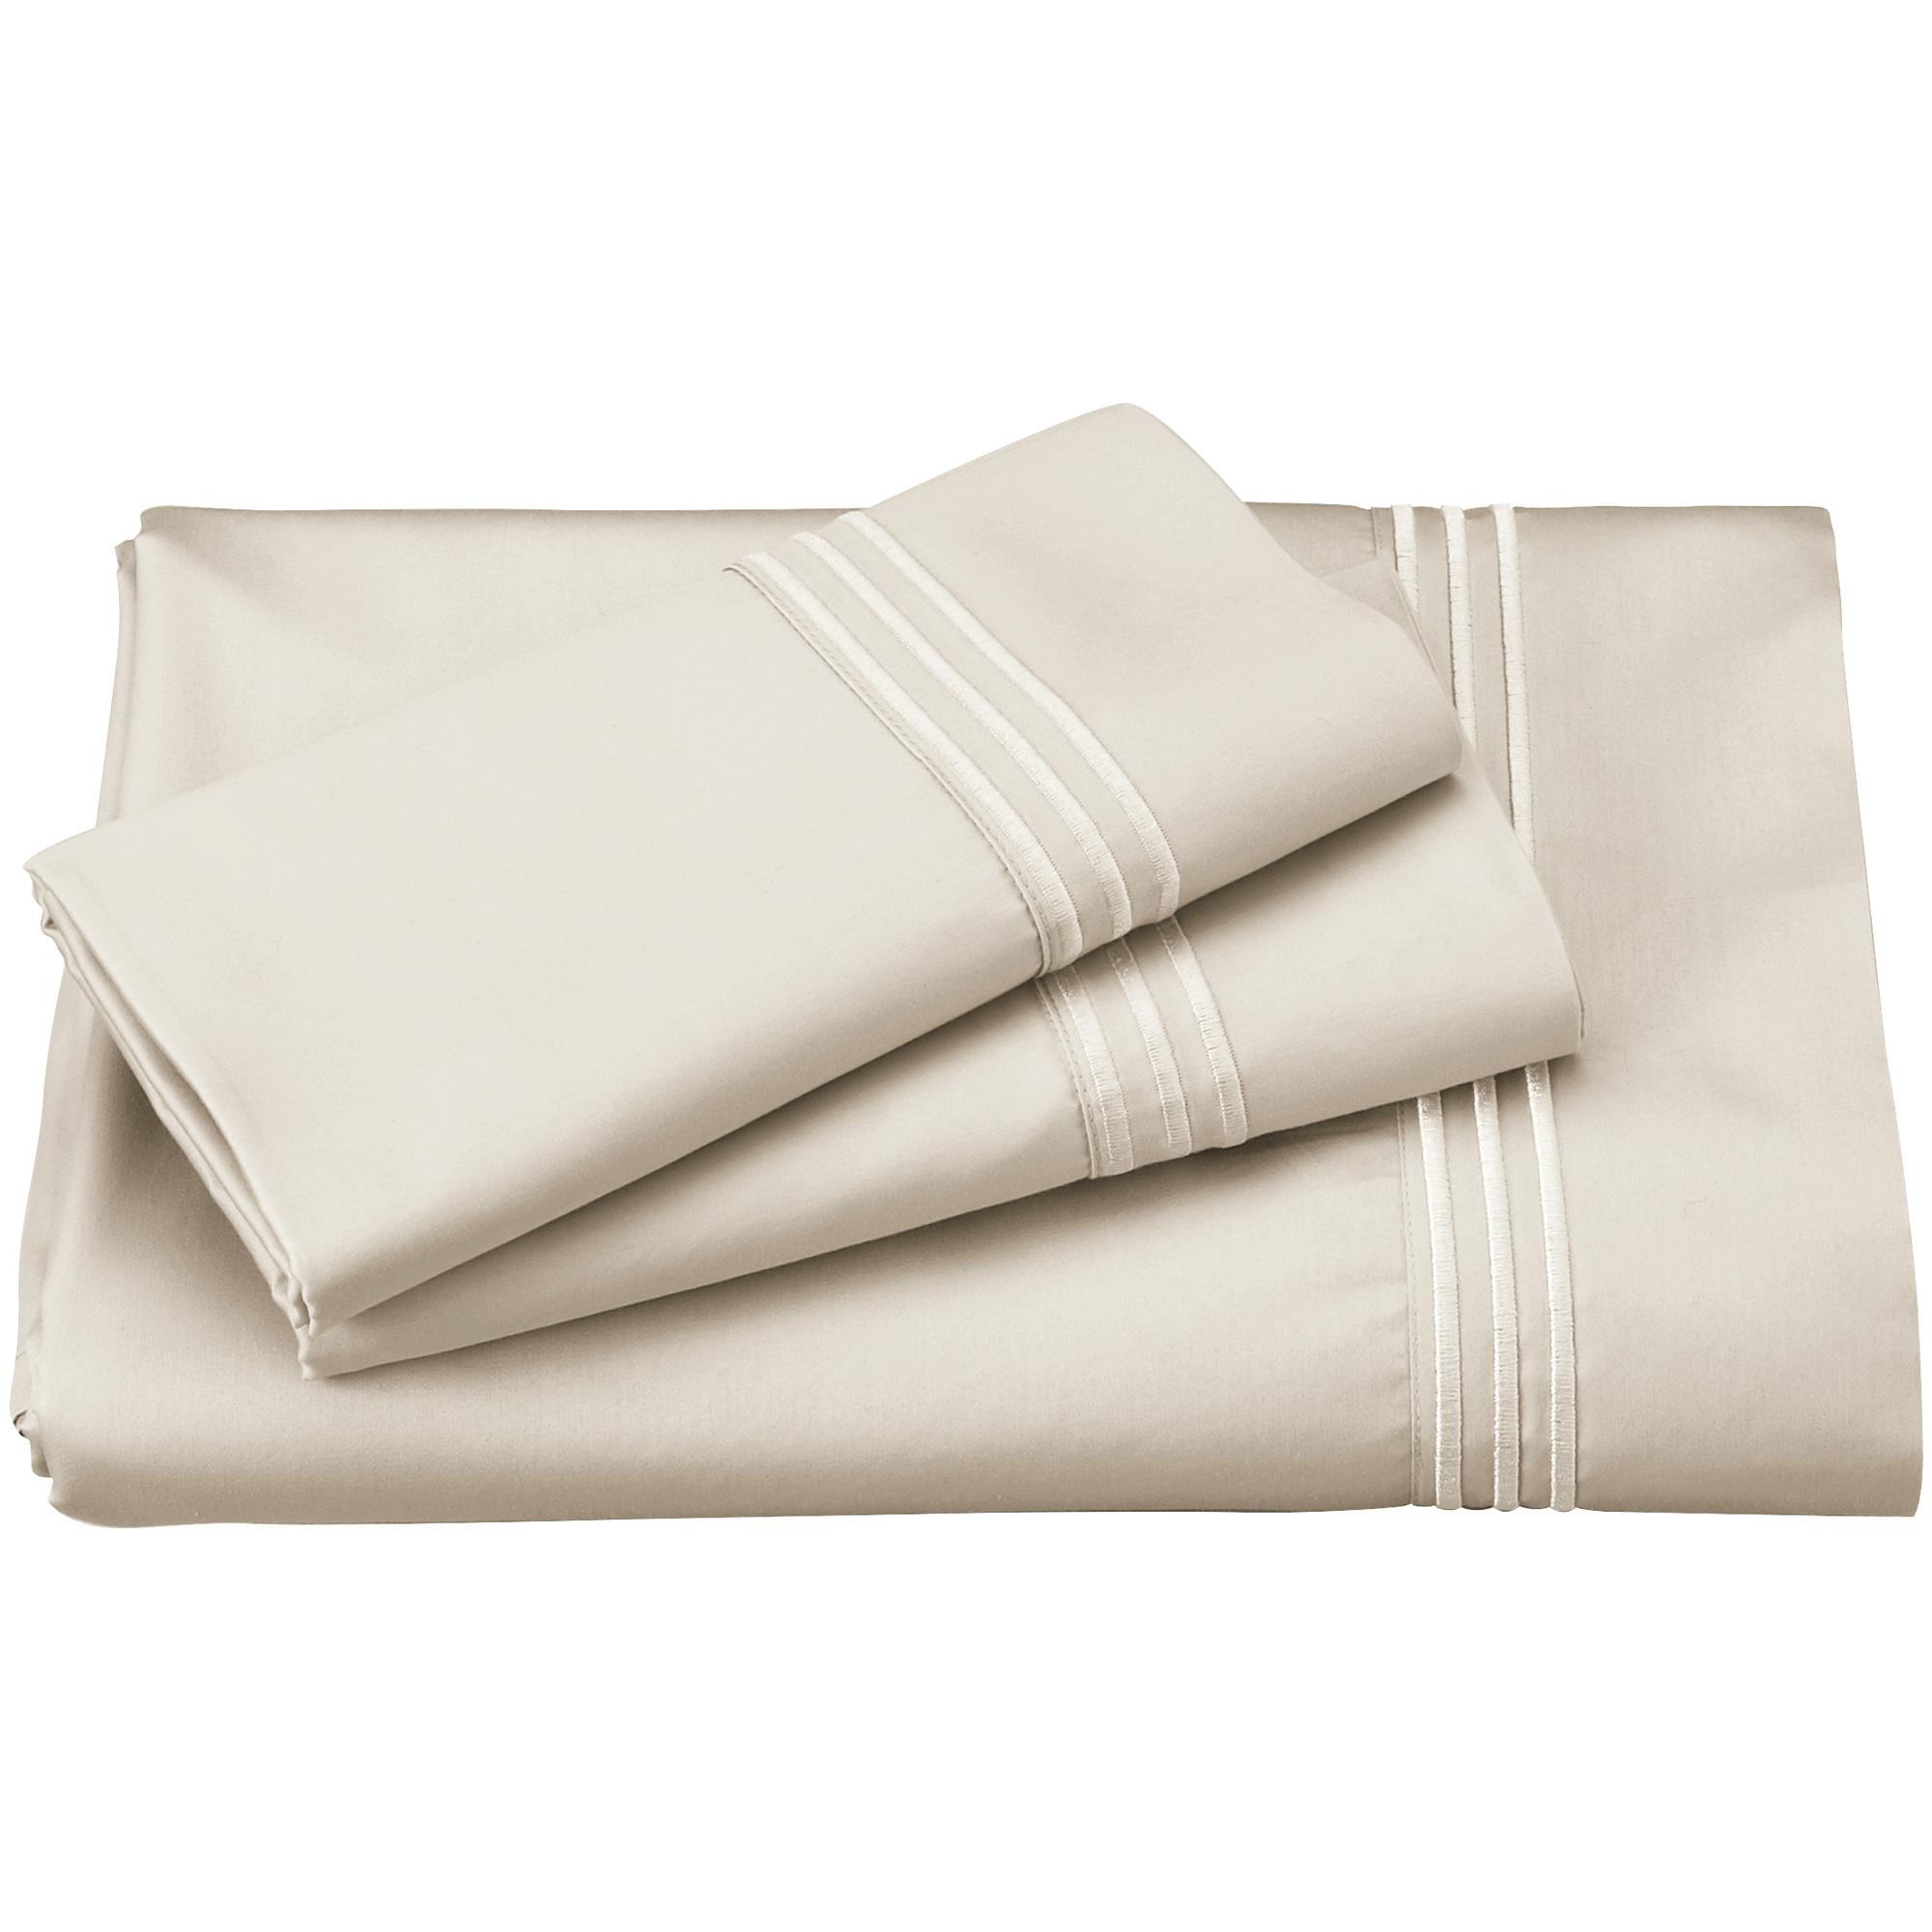 Purecare | Elements Ivory California King Celliant Sheet Set